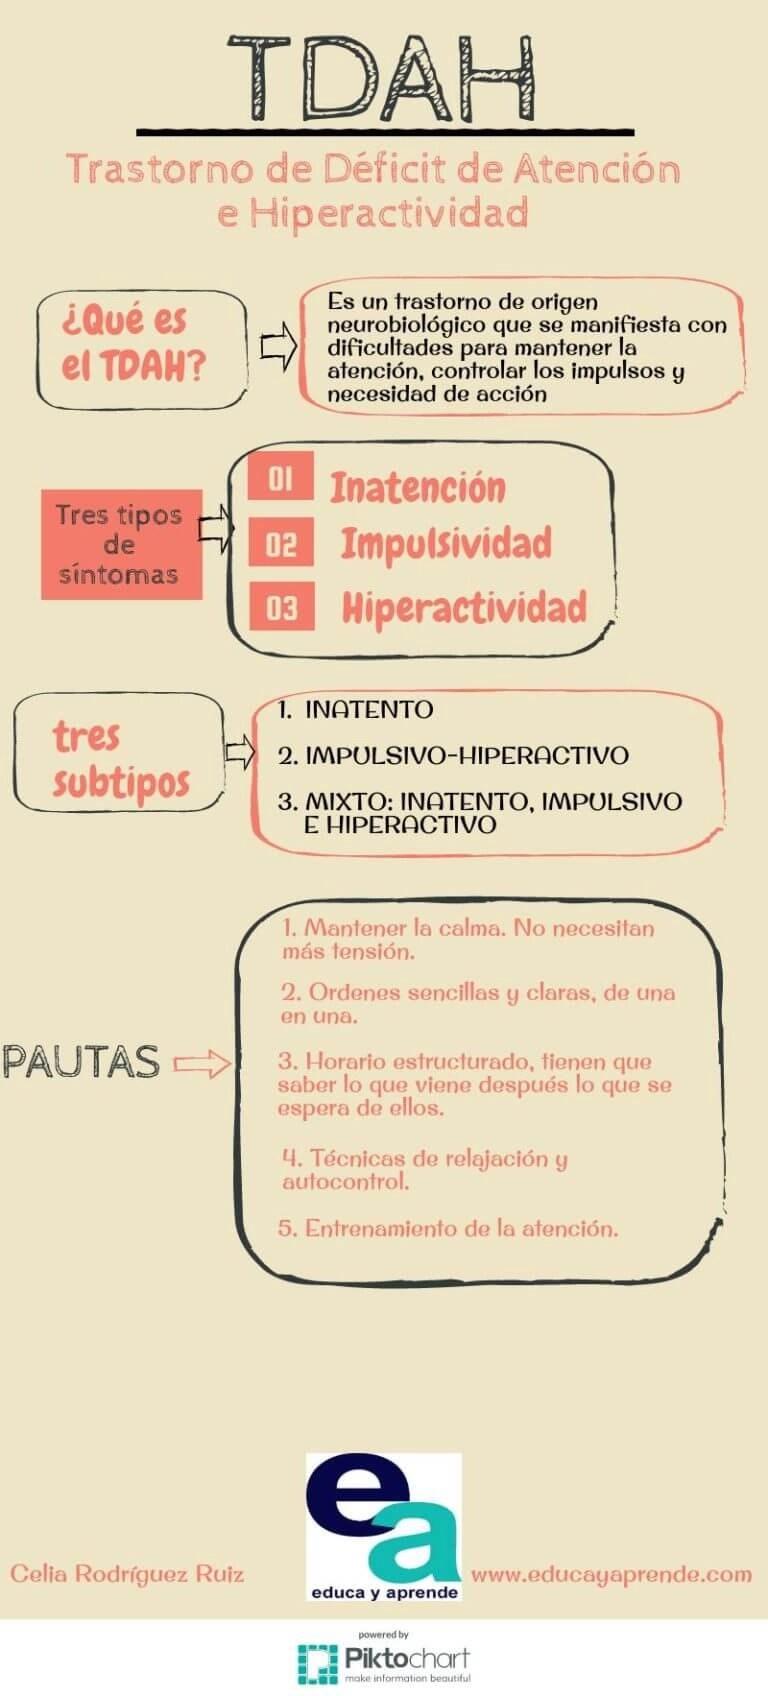 Infografía TDAH, tdah, Hiperactividad